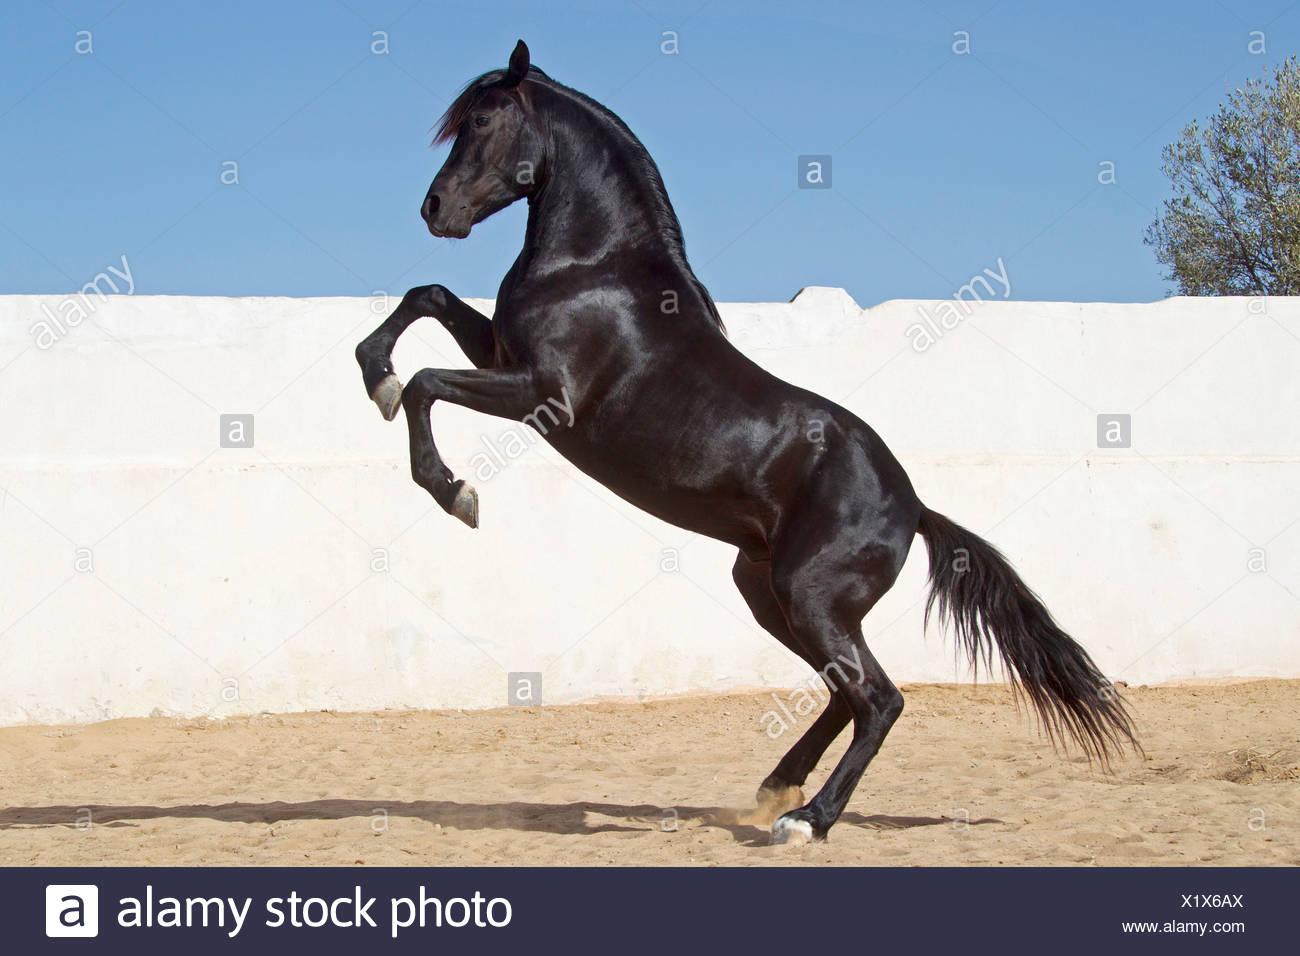 Arabian Horse Black Stallion Rearing In A Paddock Stock Photo Alamy